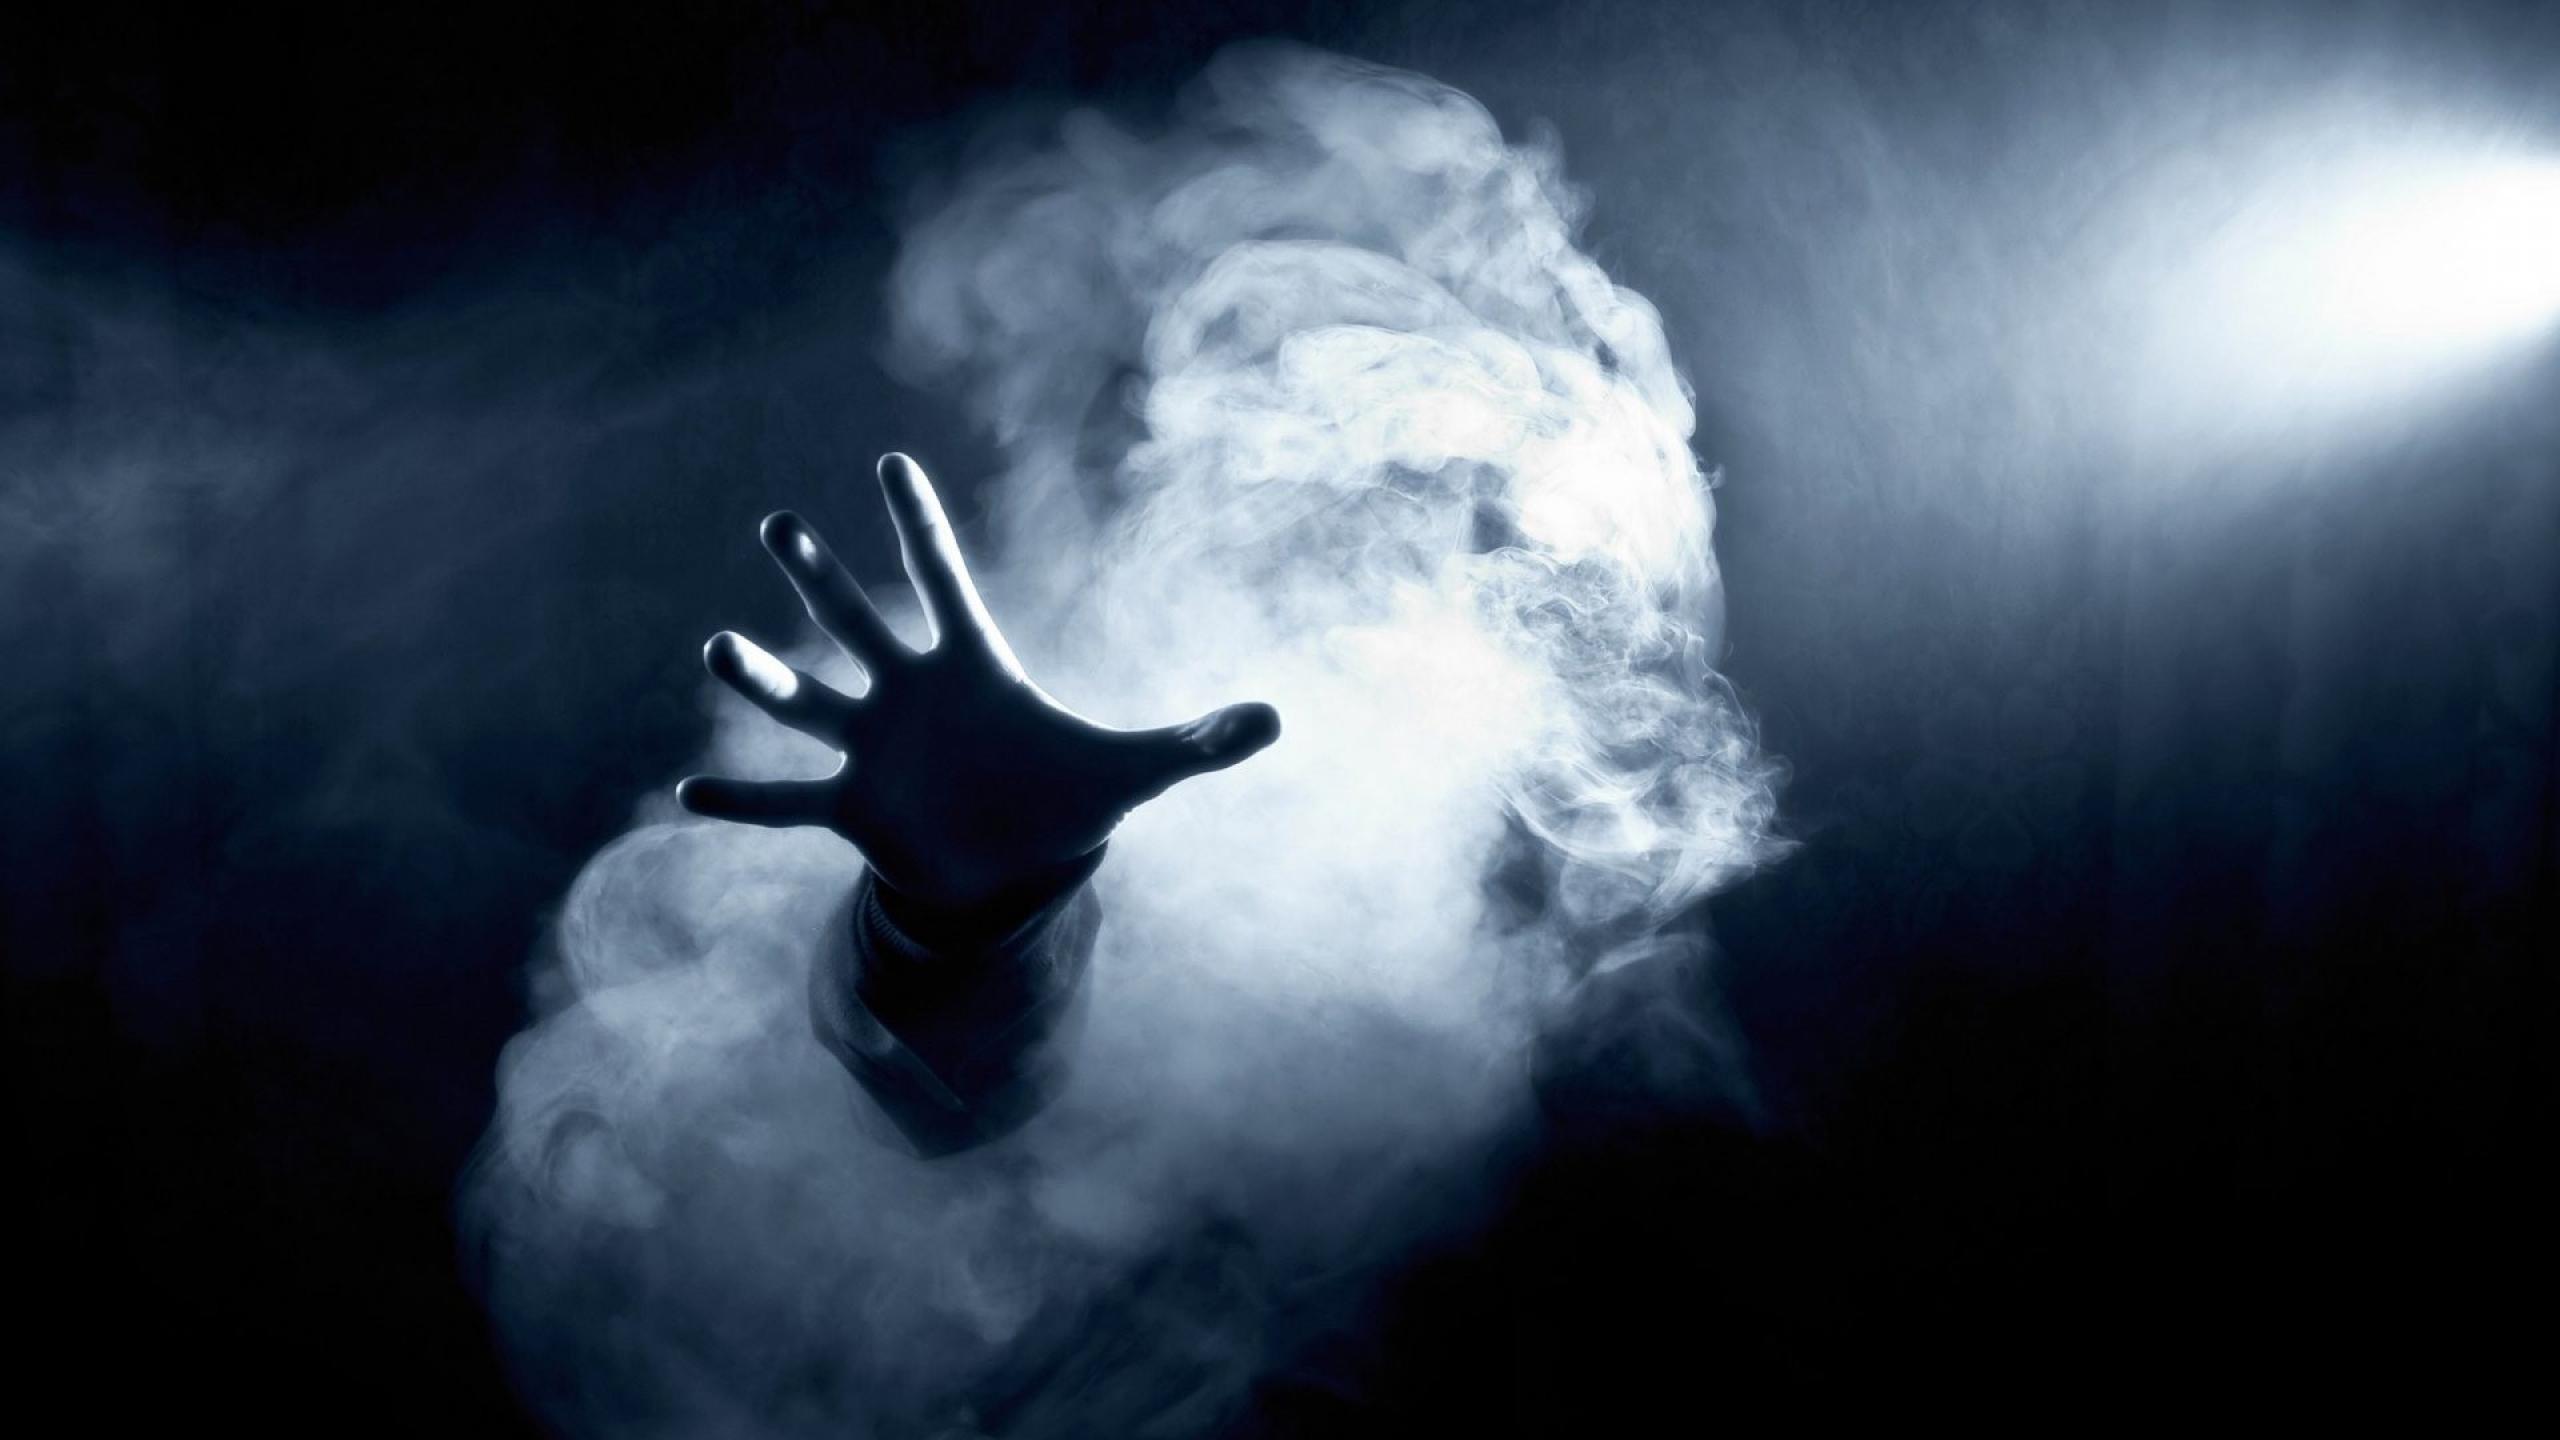 fantasma via ghibellina